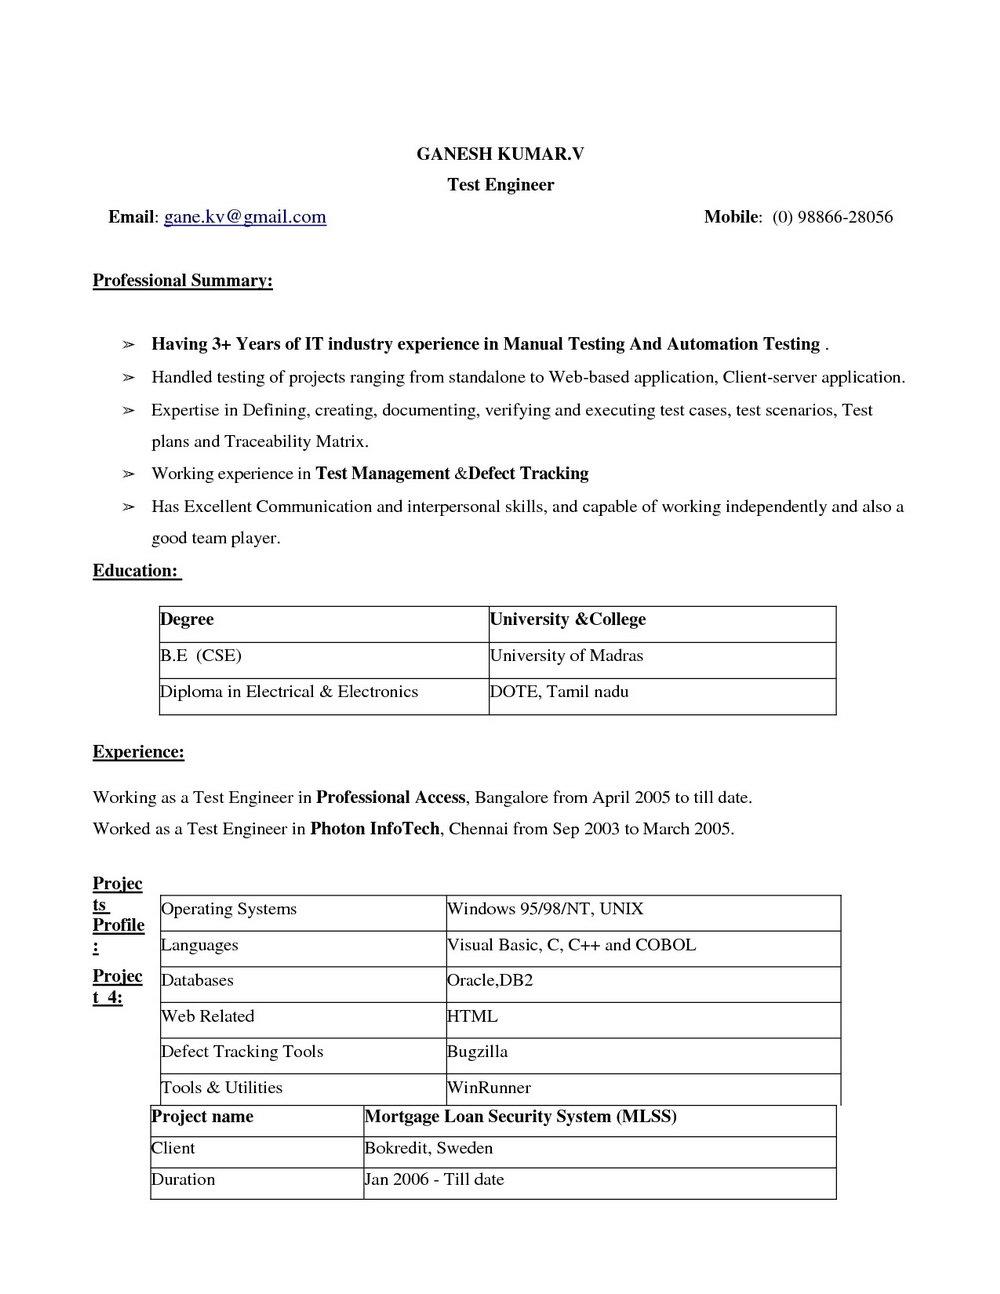 Resume Templates Microsoft Word 2017 Make Resume Within Resume